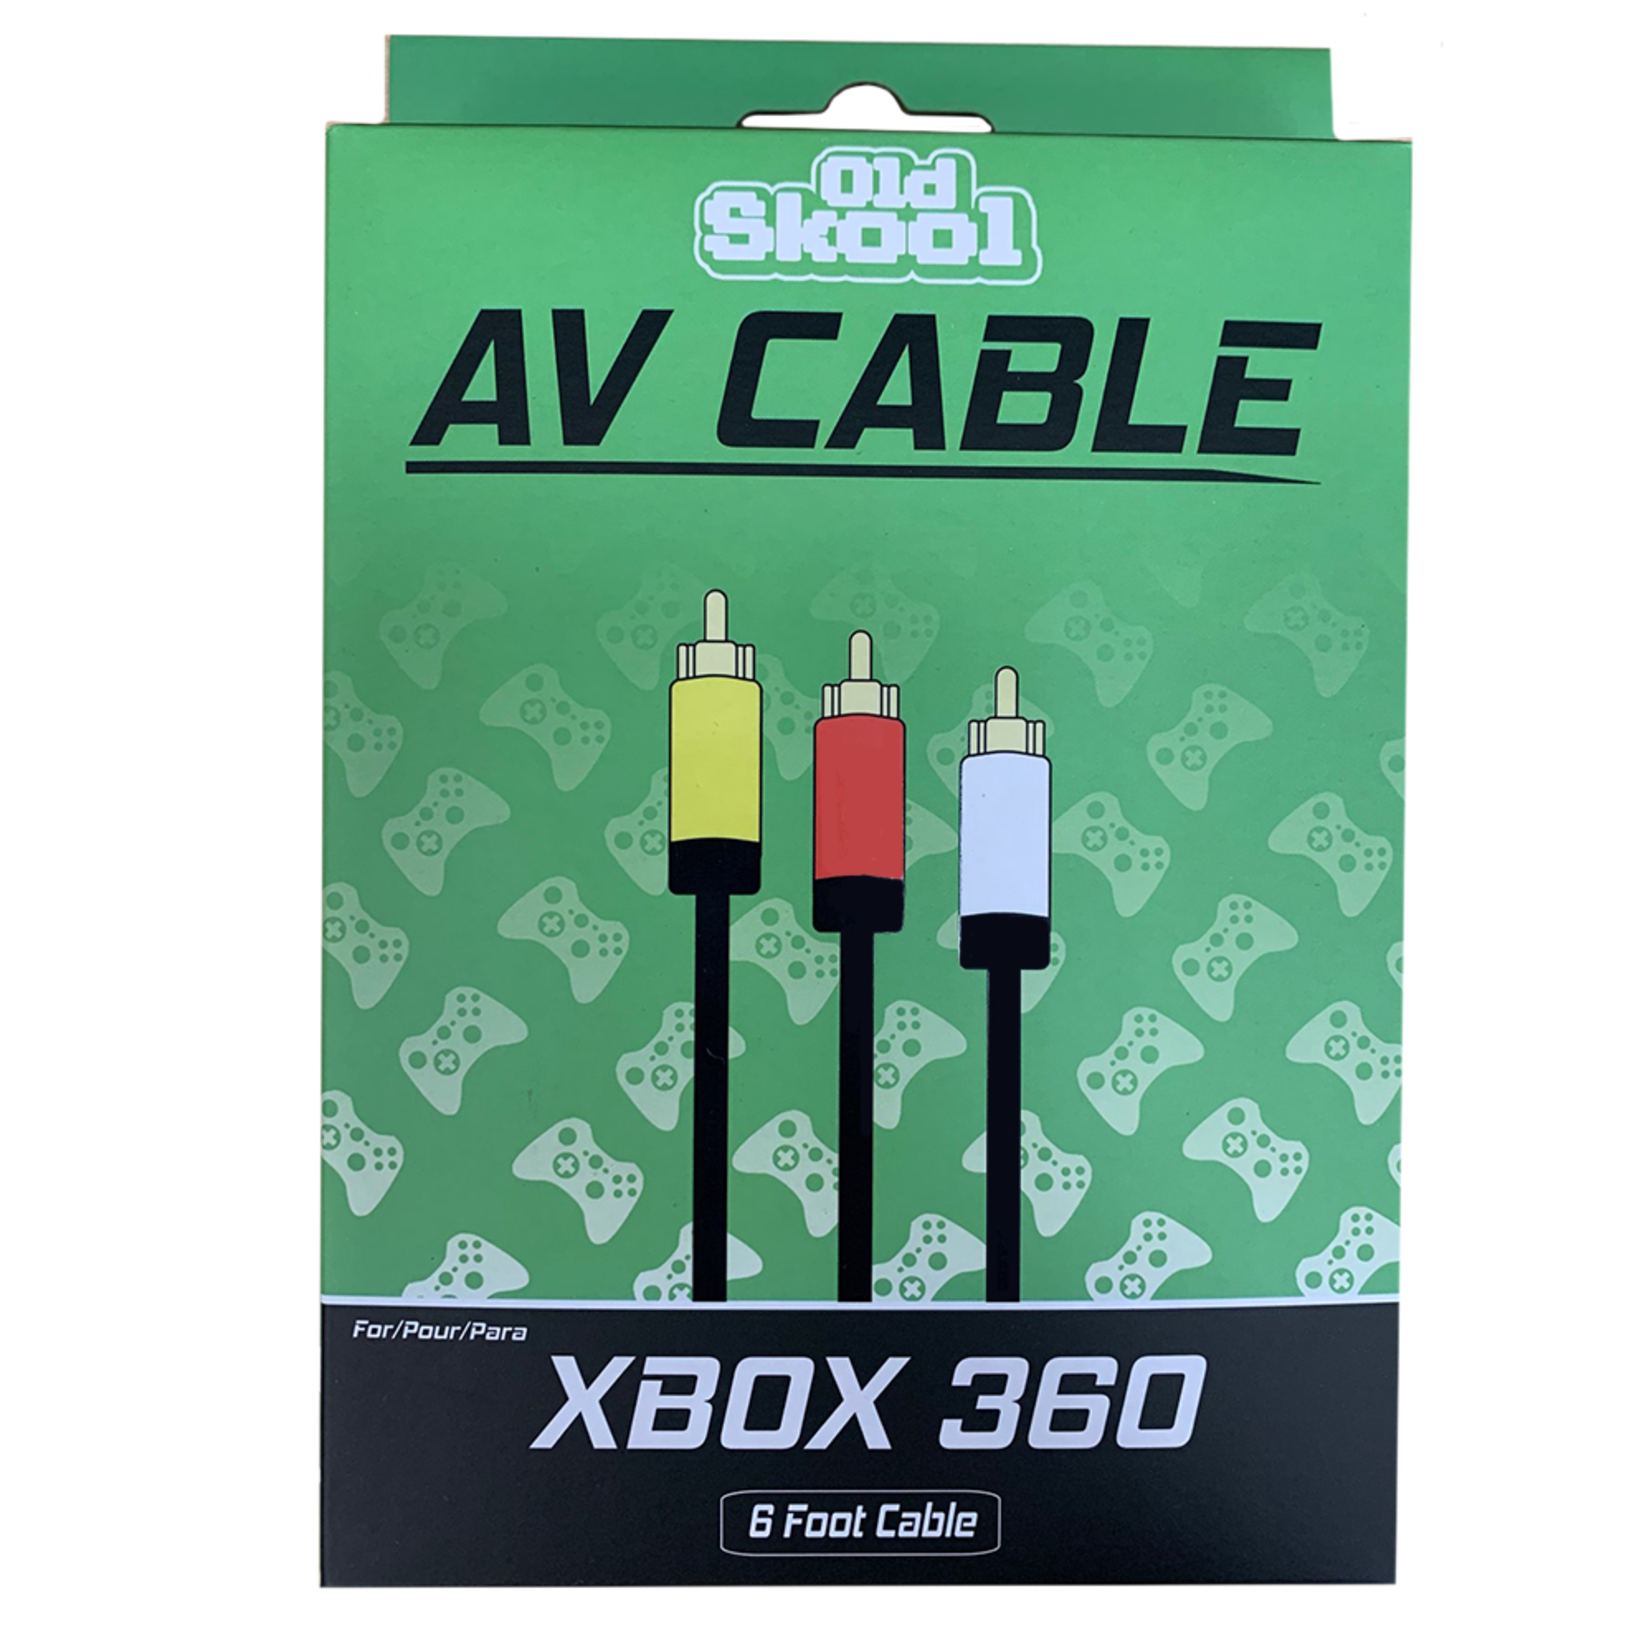 Old Skool AV Cable for Xbox 360